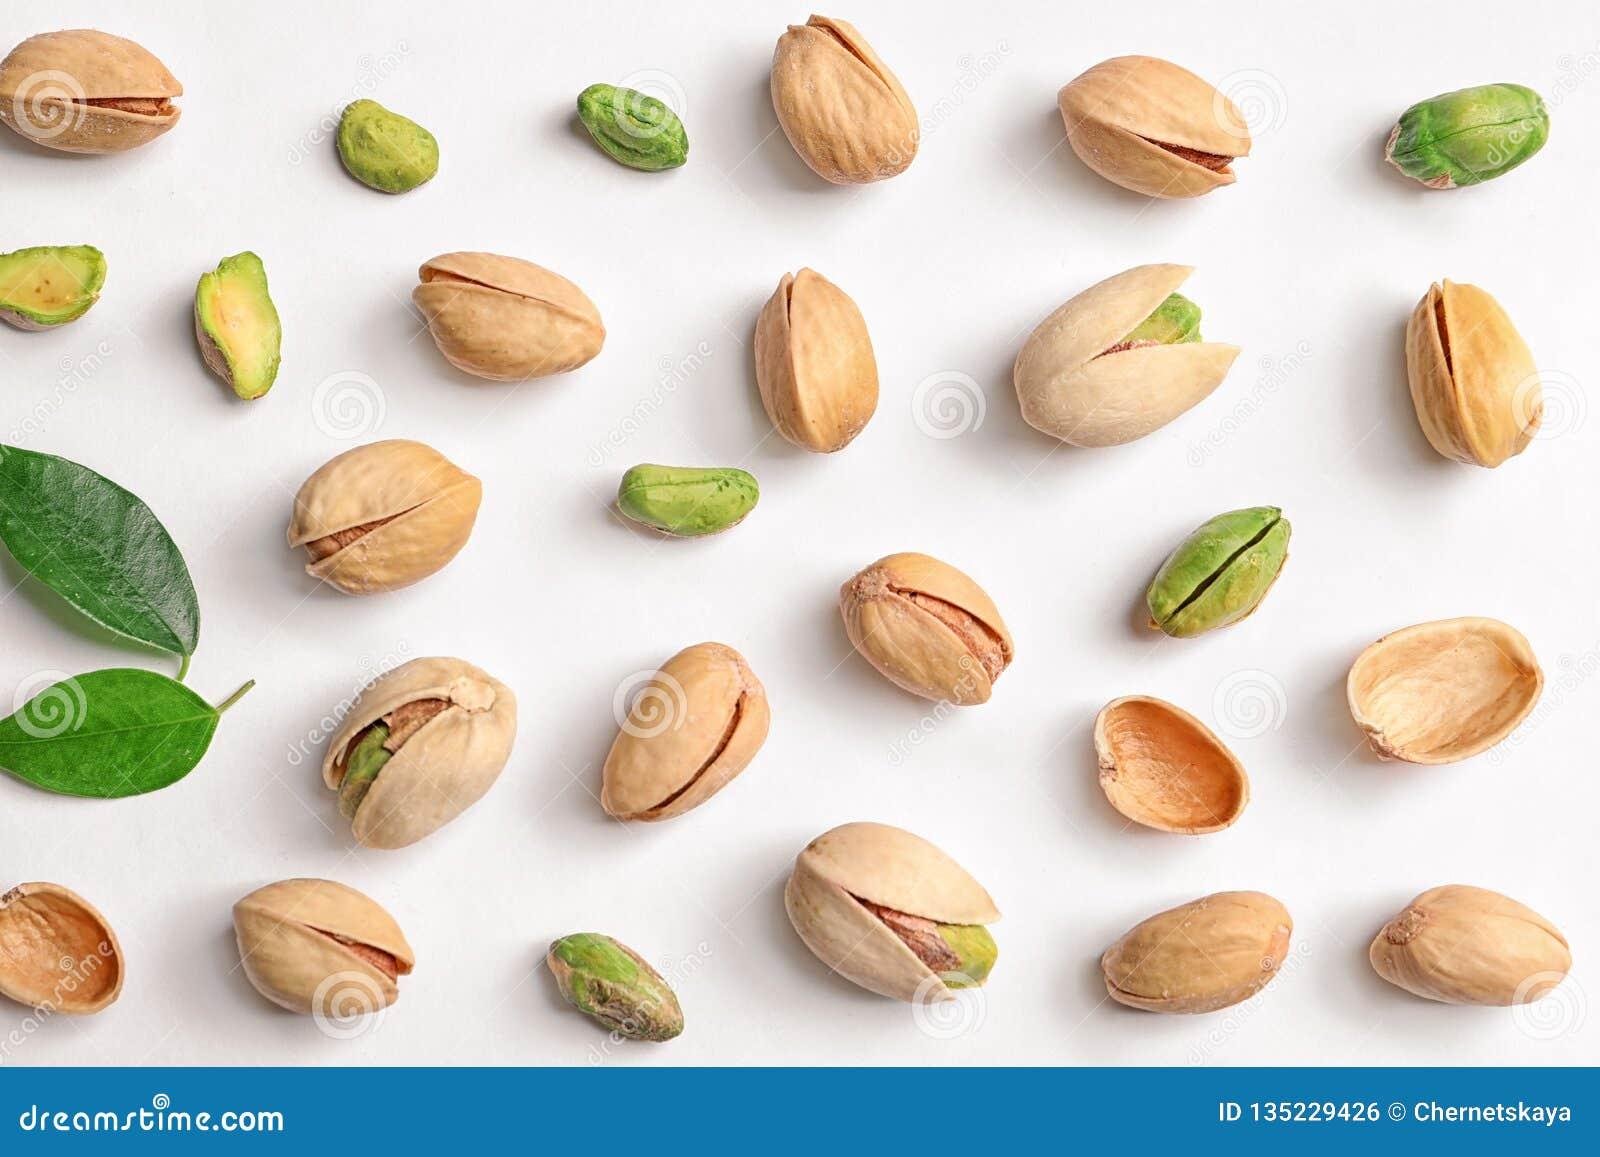 Organic pistachio nuts on white background